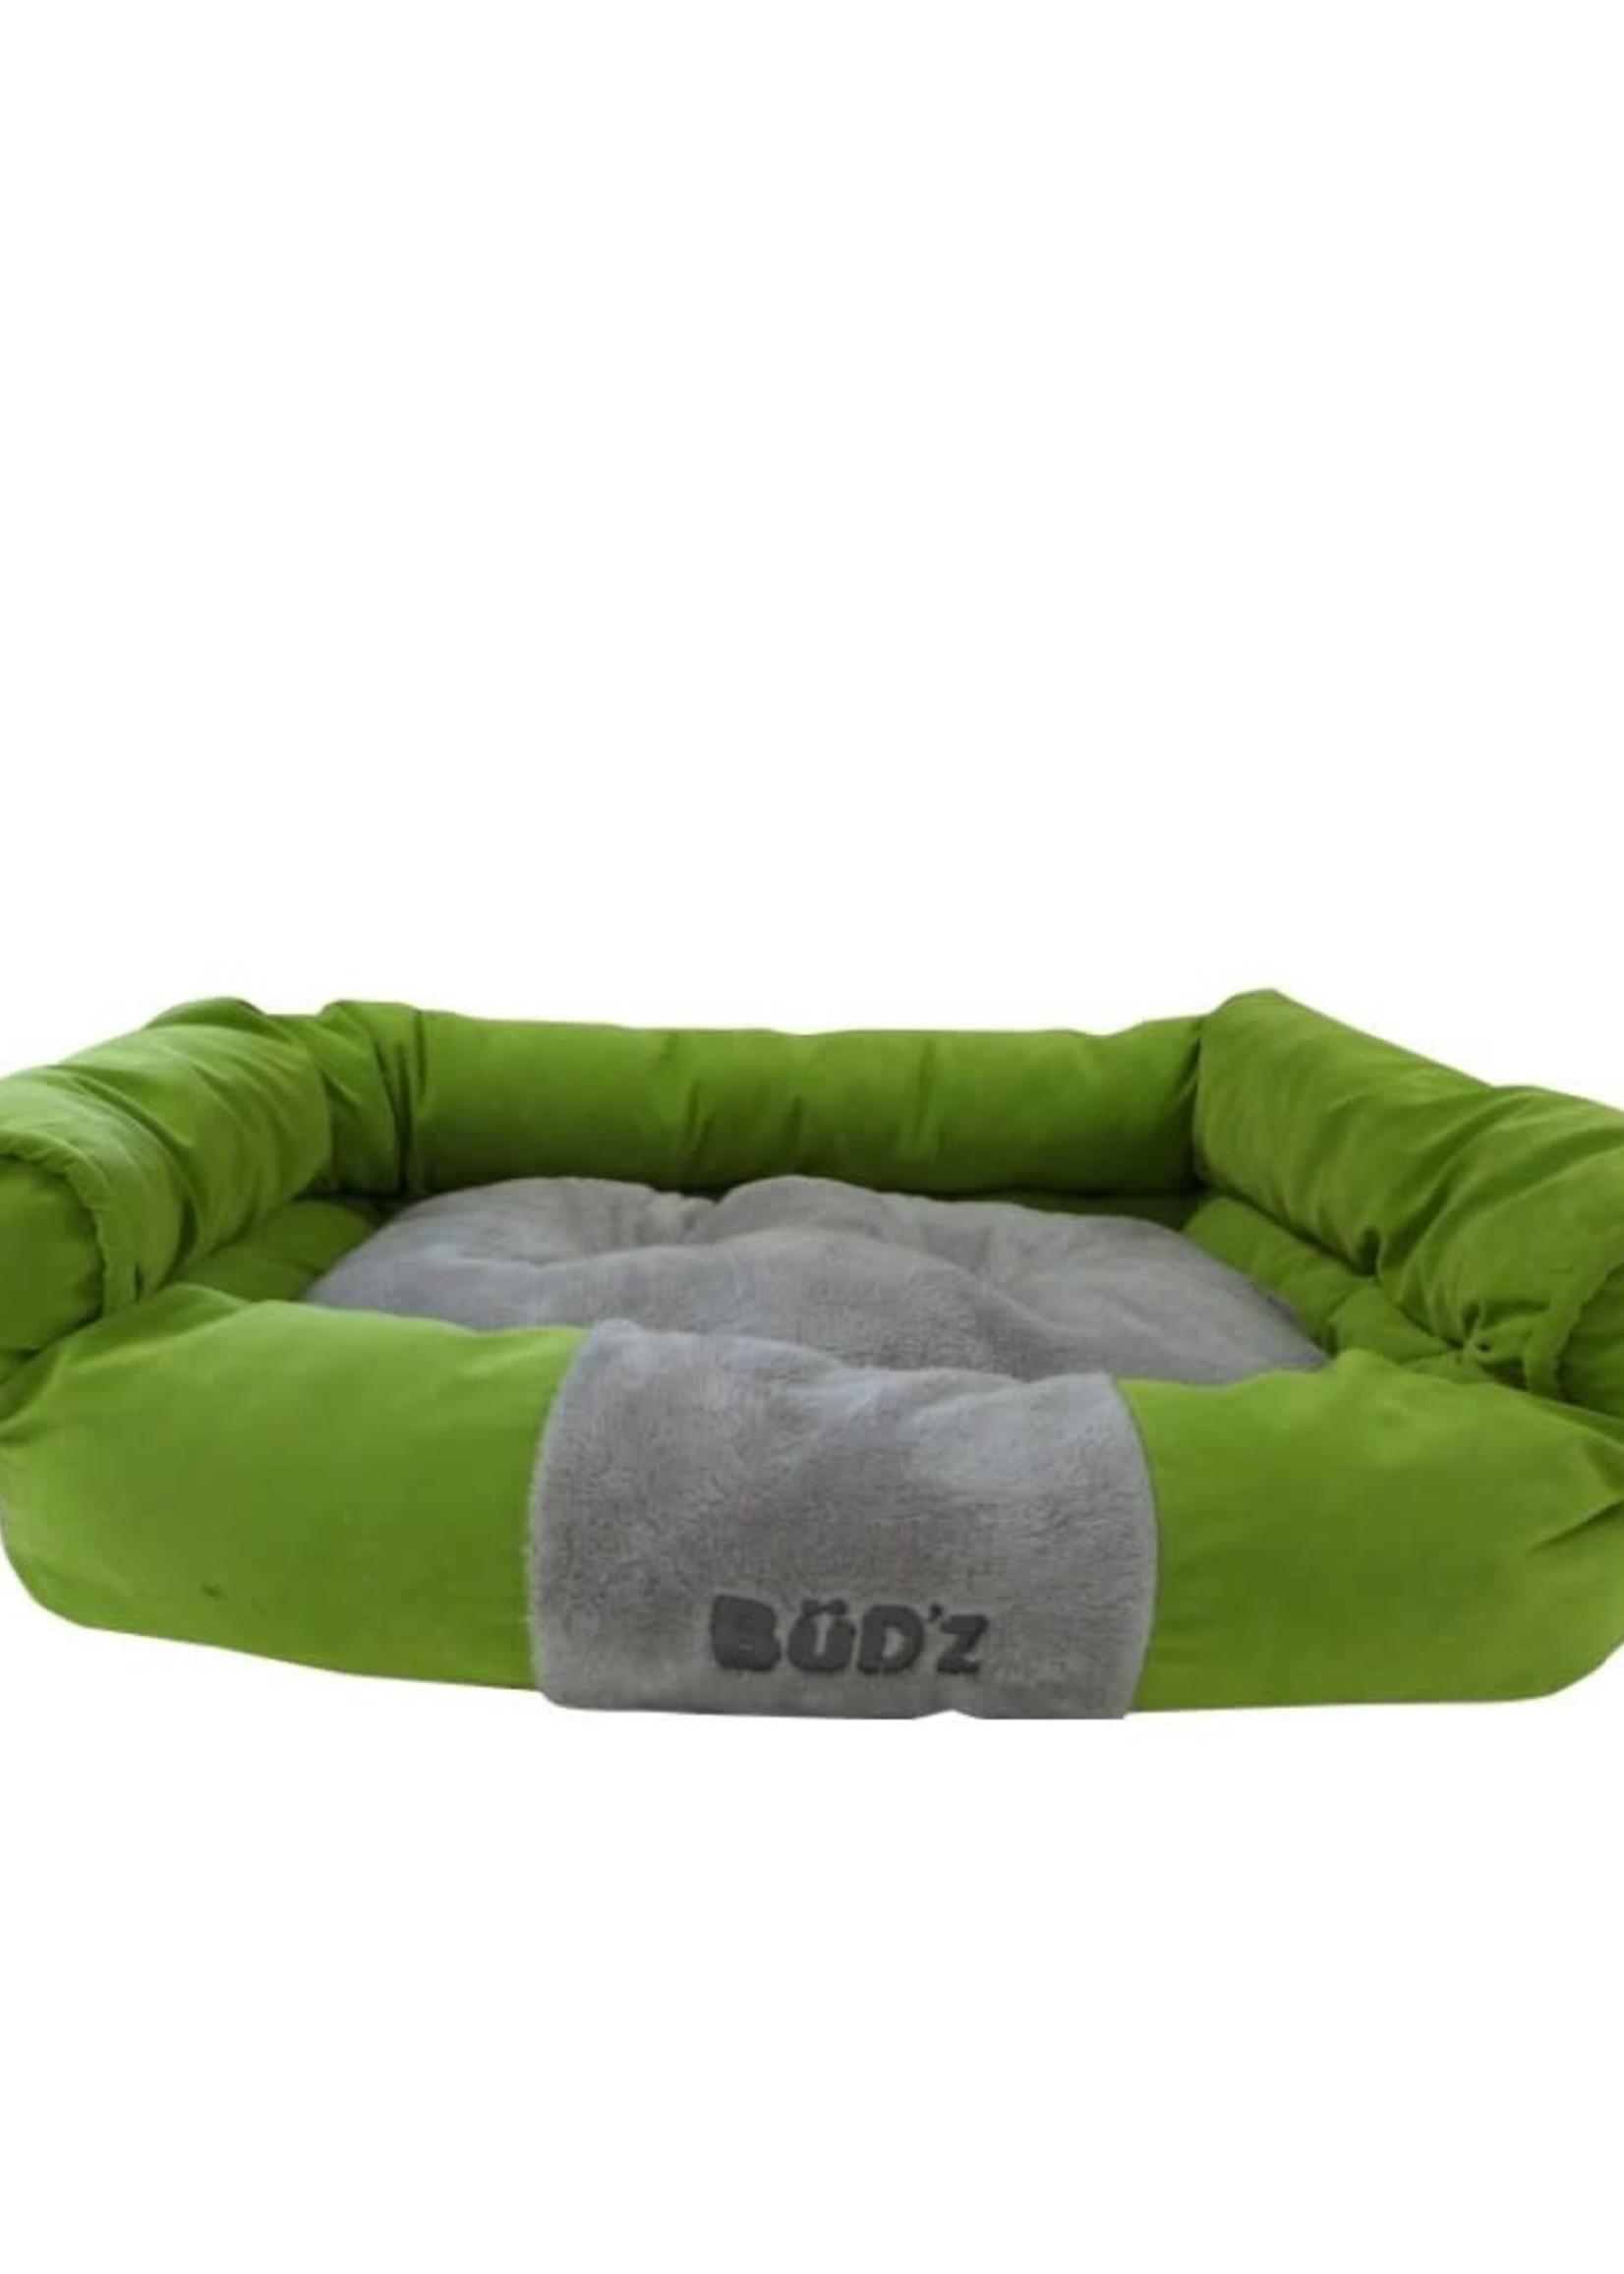 "Büd'z® BUD'Z SOFA BED GREEN 31""x24"""